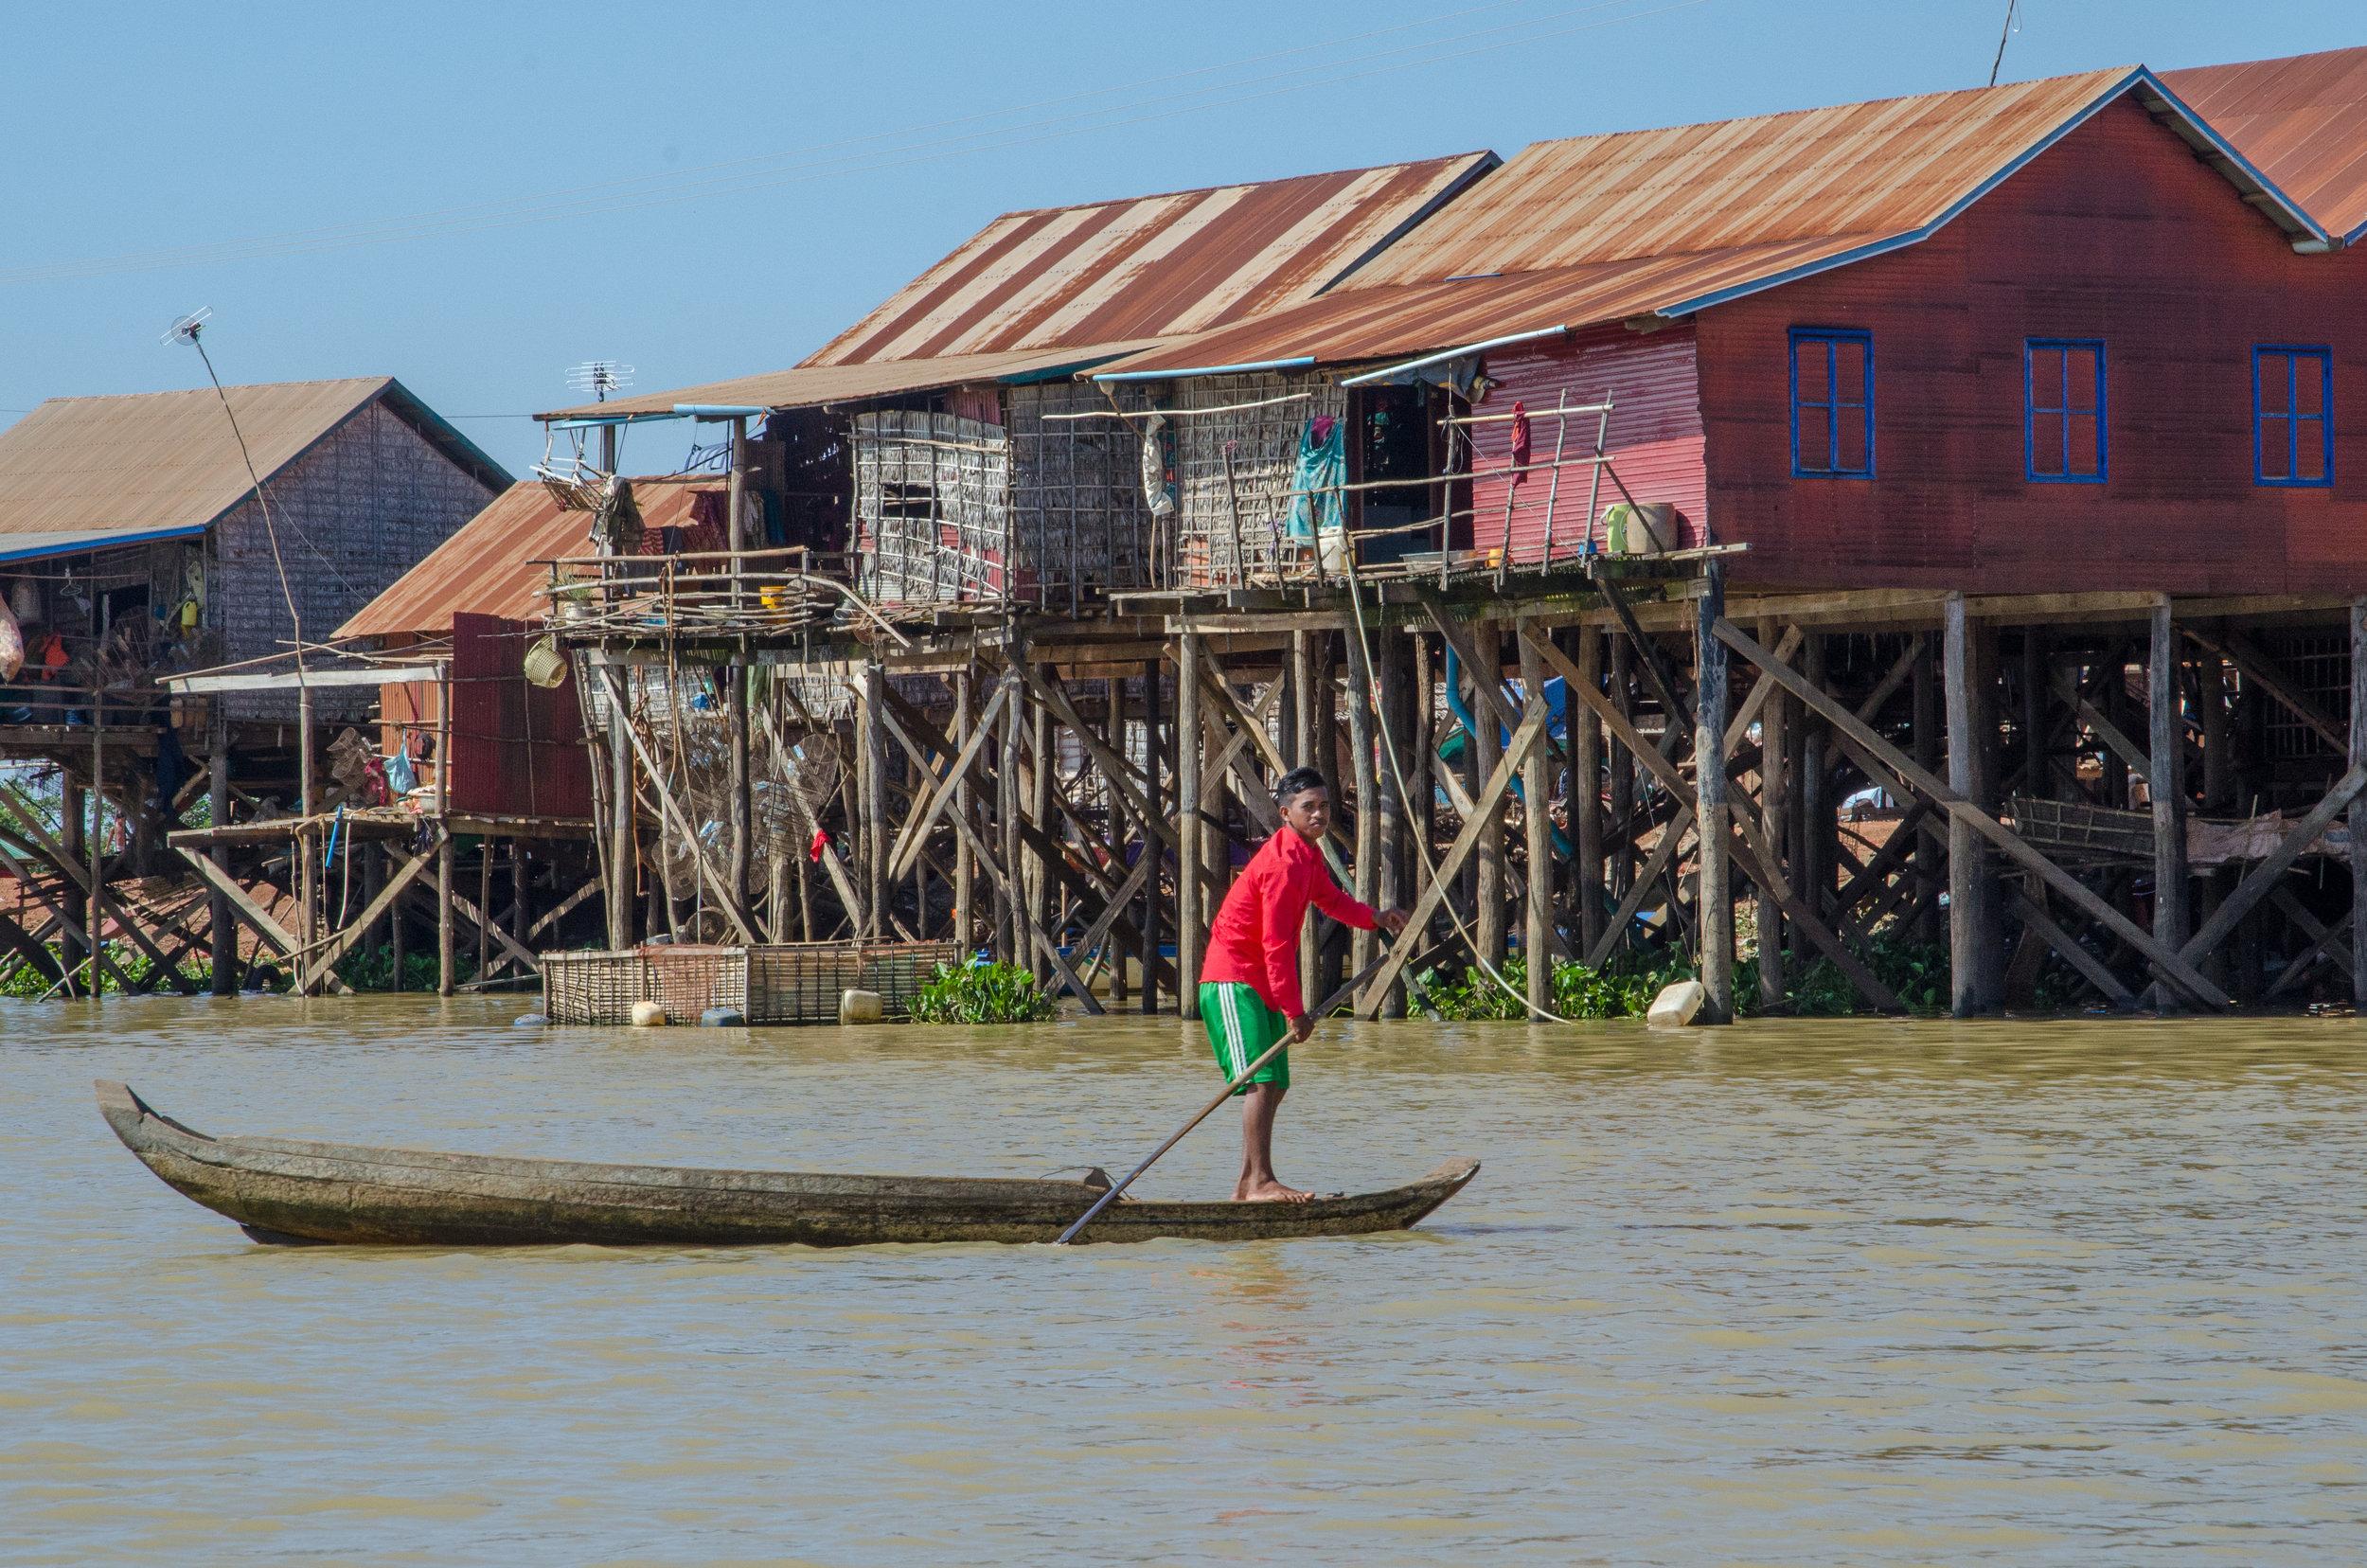 Kompong Khleang village, en route to Tonle Sap Lake, Cambodia